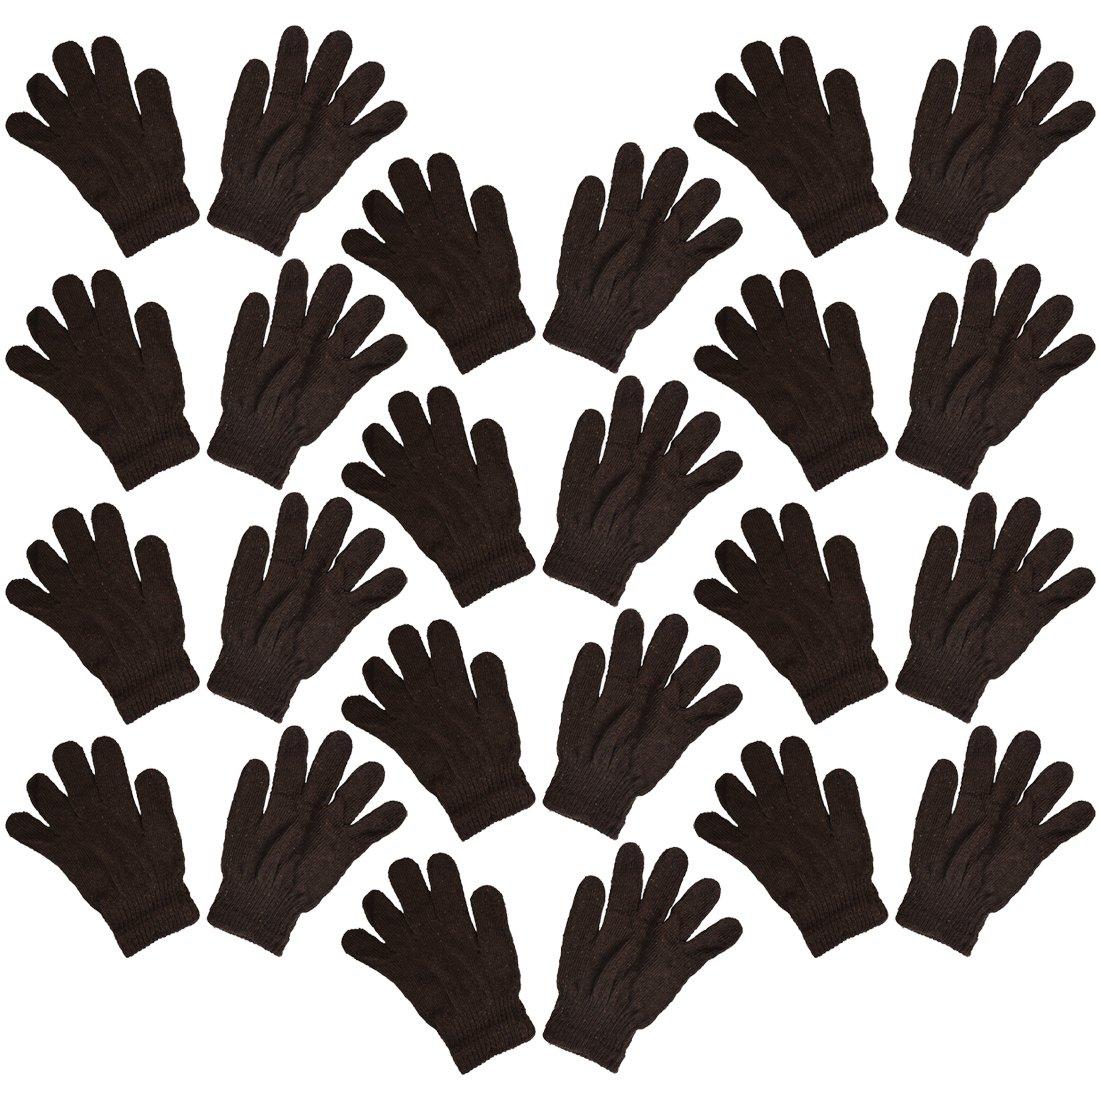 Set of 12 Warm Knit Gloves Unisex Lots of Styles - Dusty Brown Knit